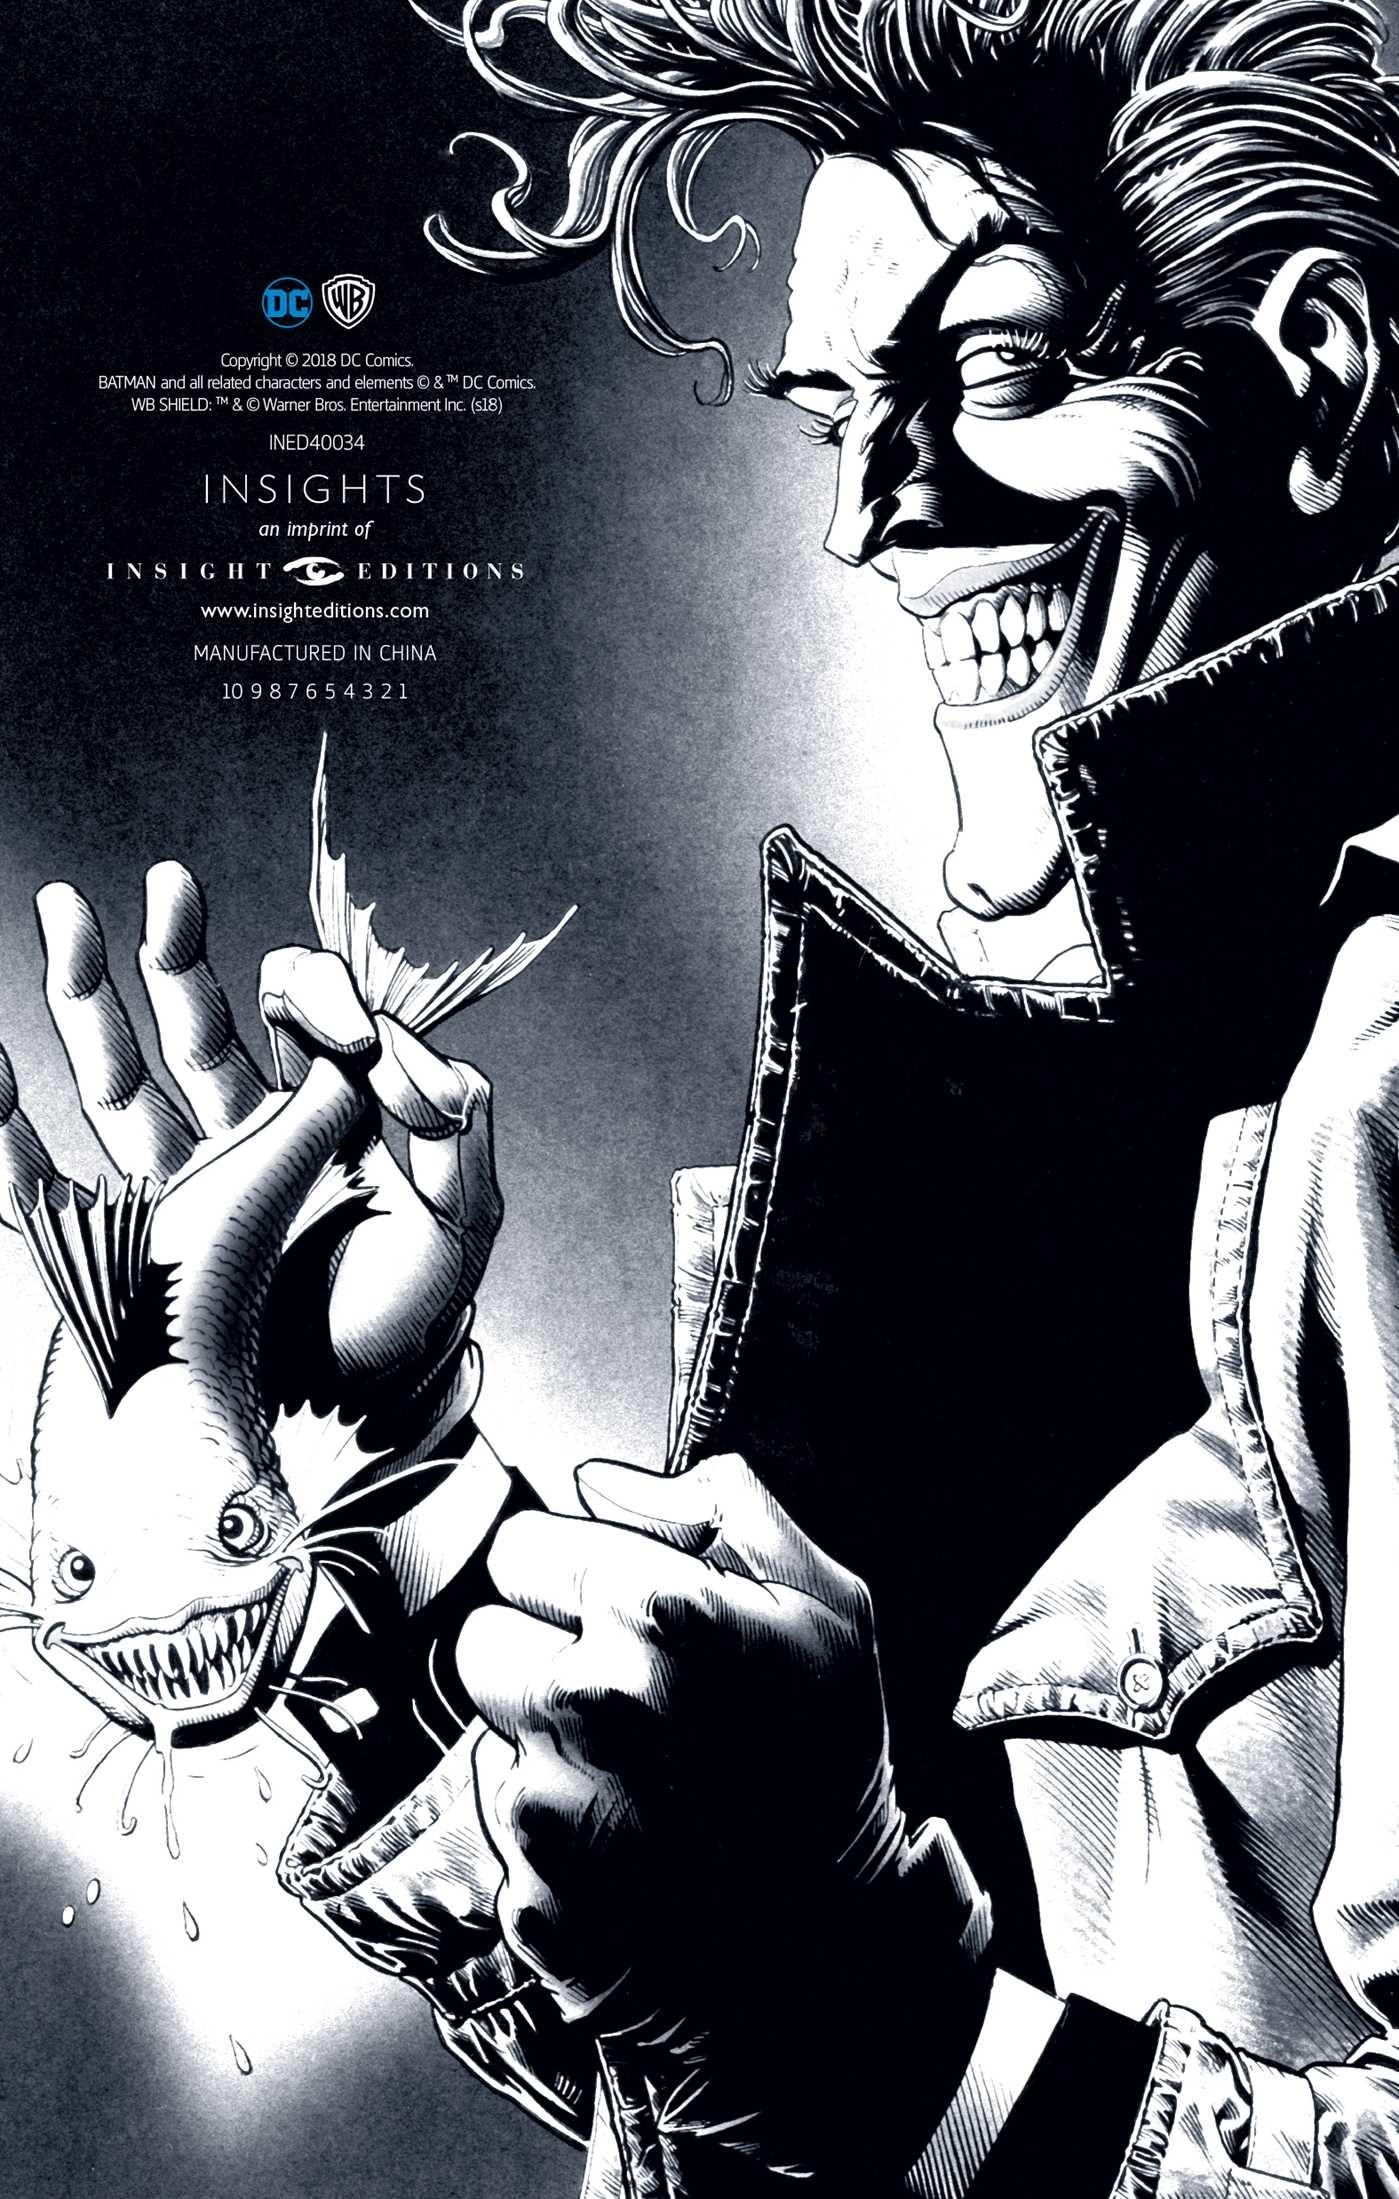 Dc comics the joker hardcover ruled journal artist edition 9781683833307.in03